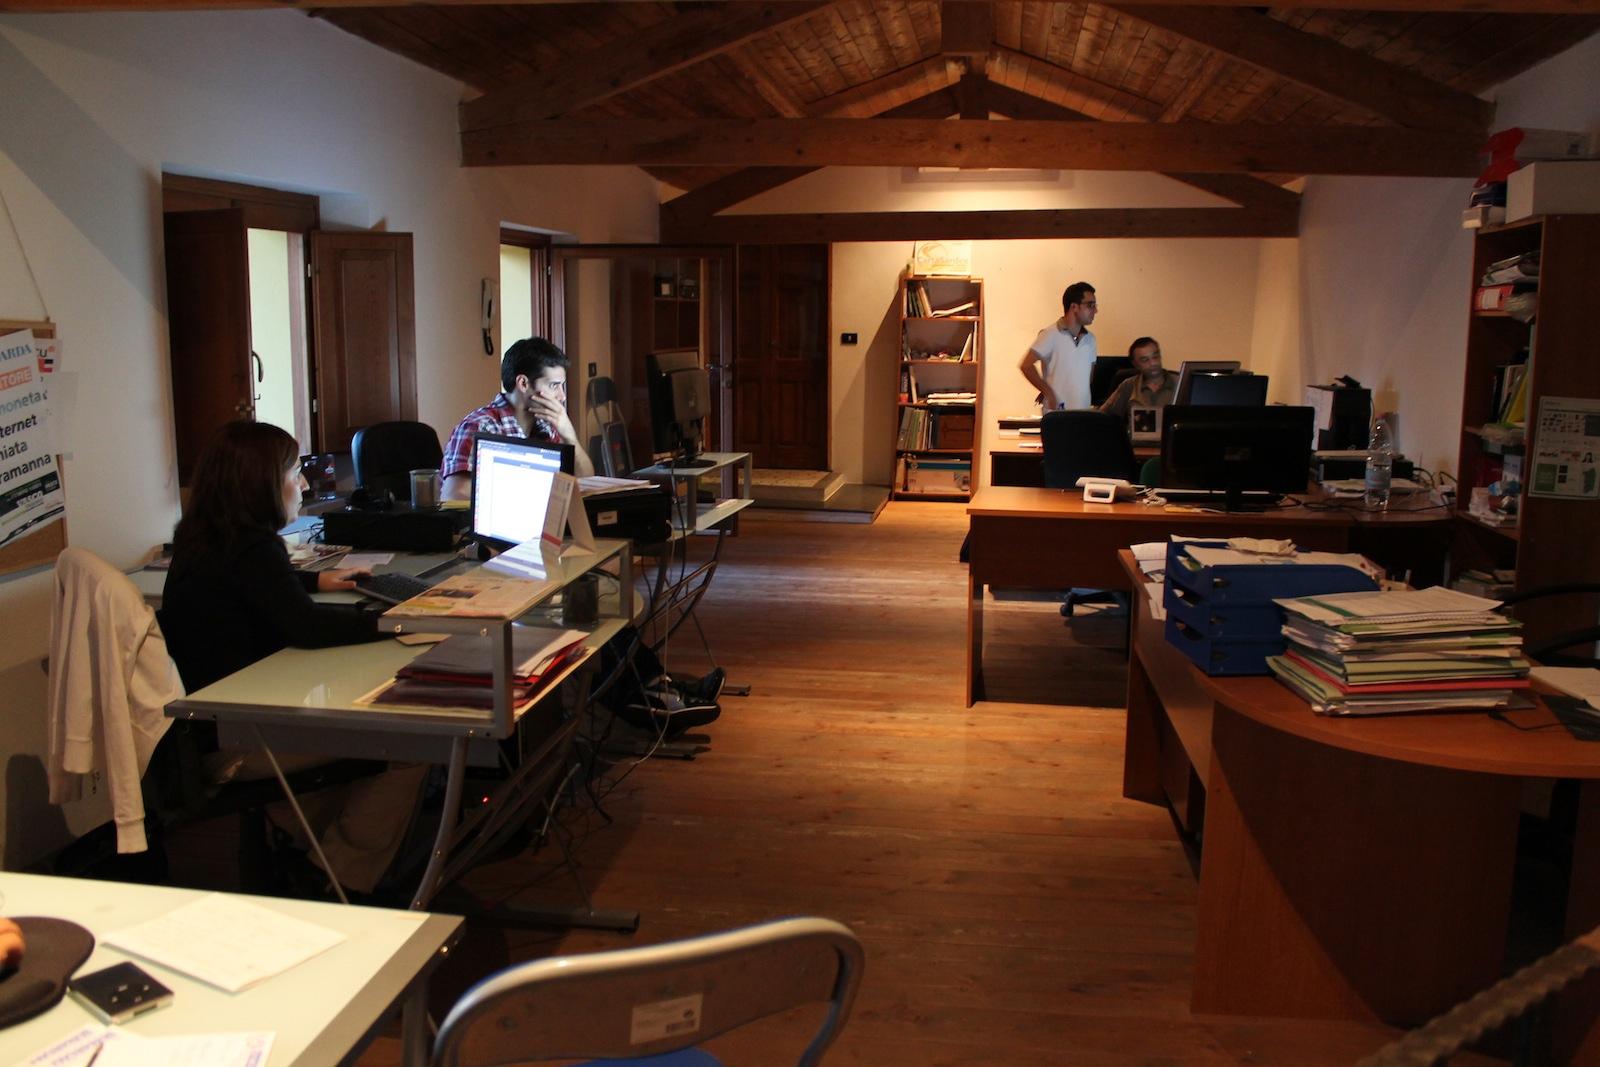 La sede di Sardex a Serramanna